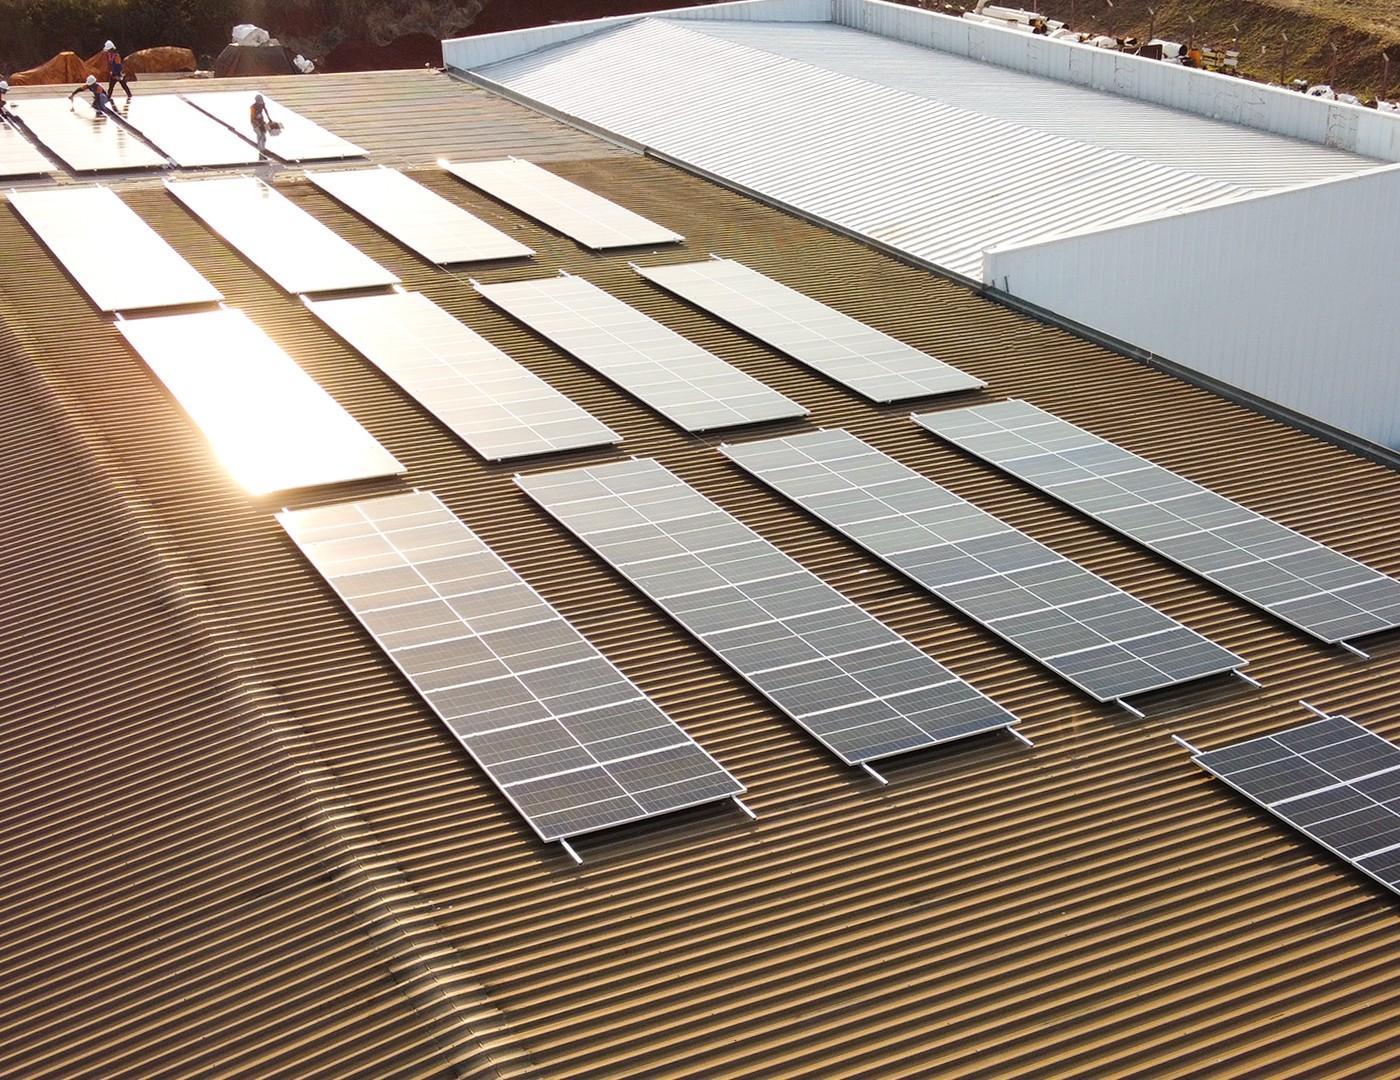 Financiamento Facilita Acesso de Consumidores à Energia Solar